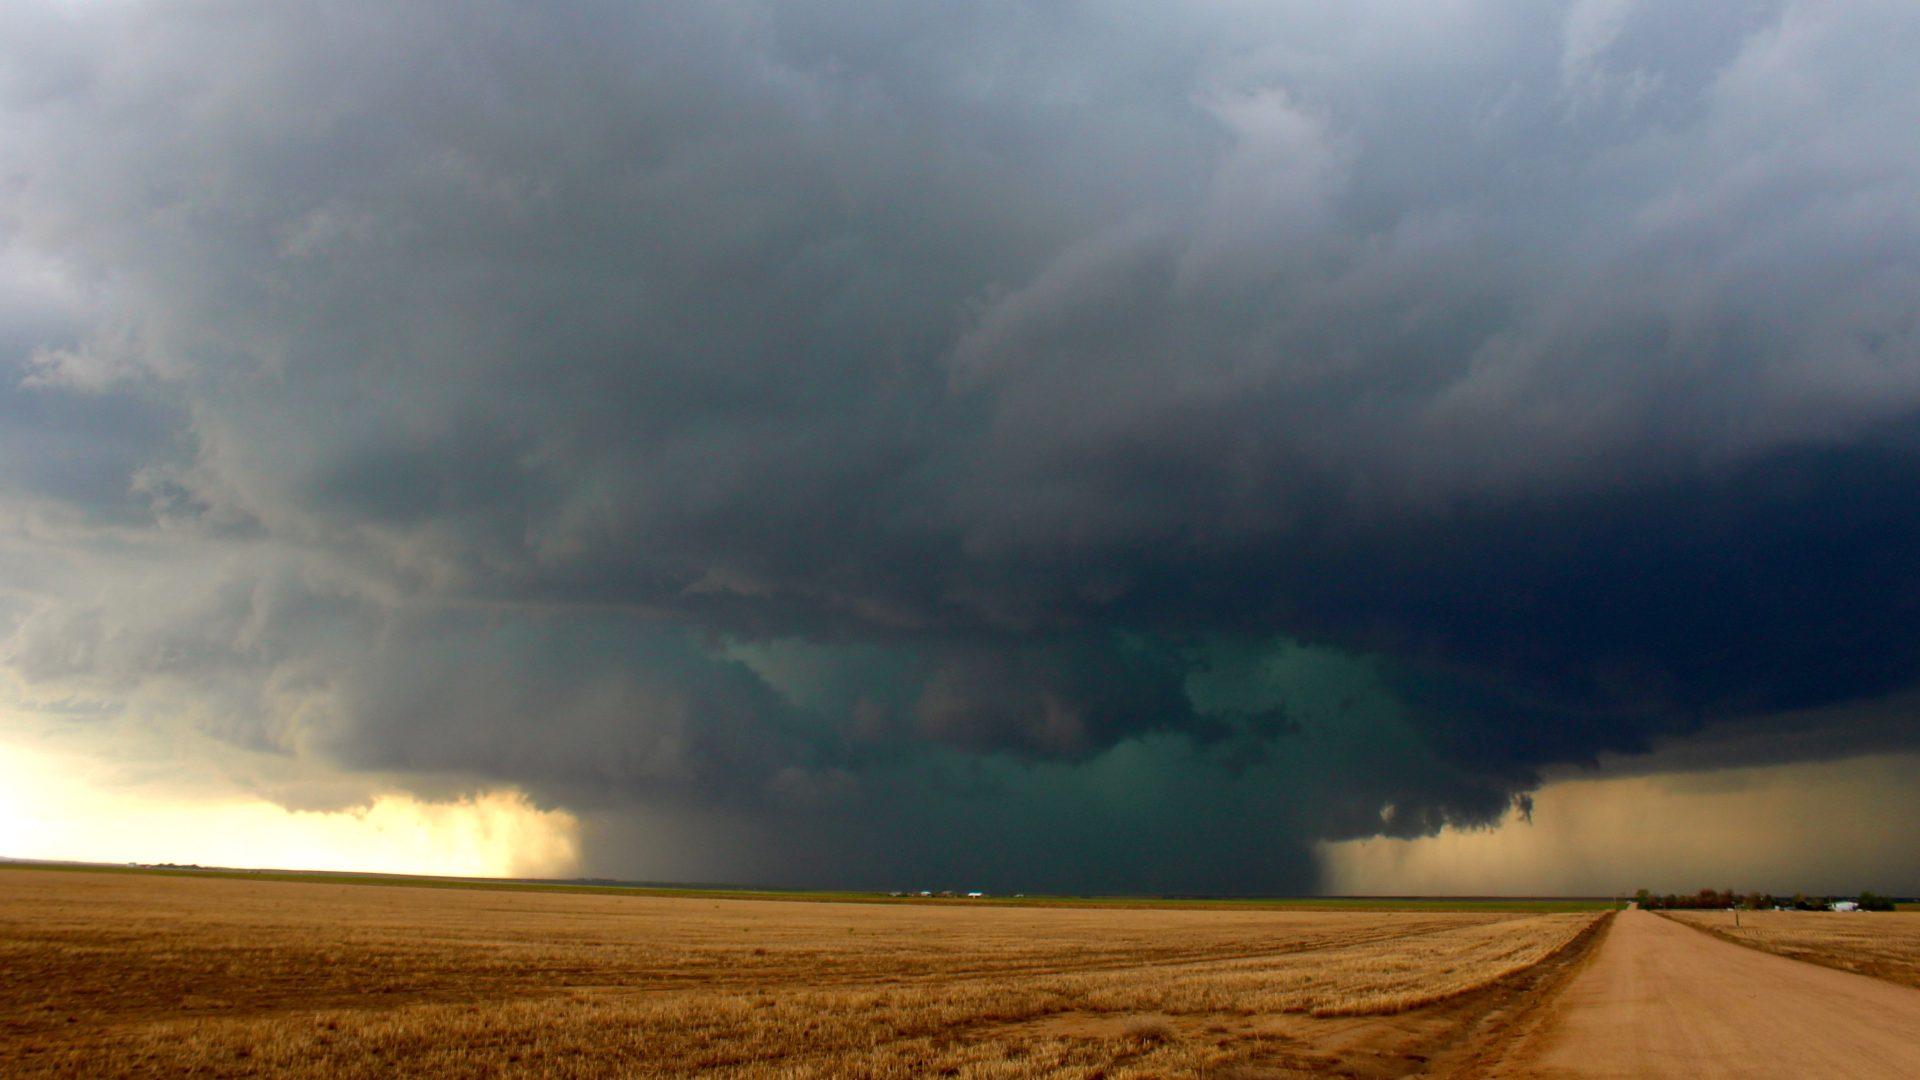 Rain-Wrapped Tornado. May 21, 2014